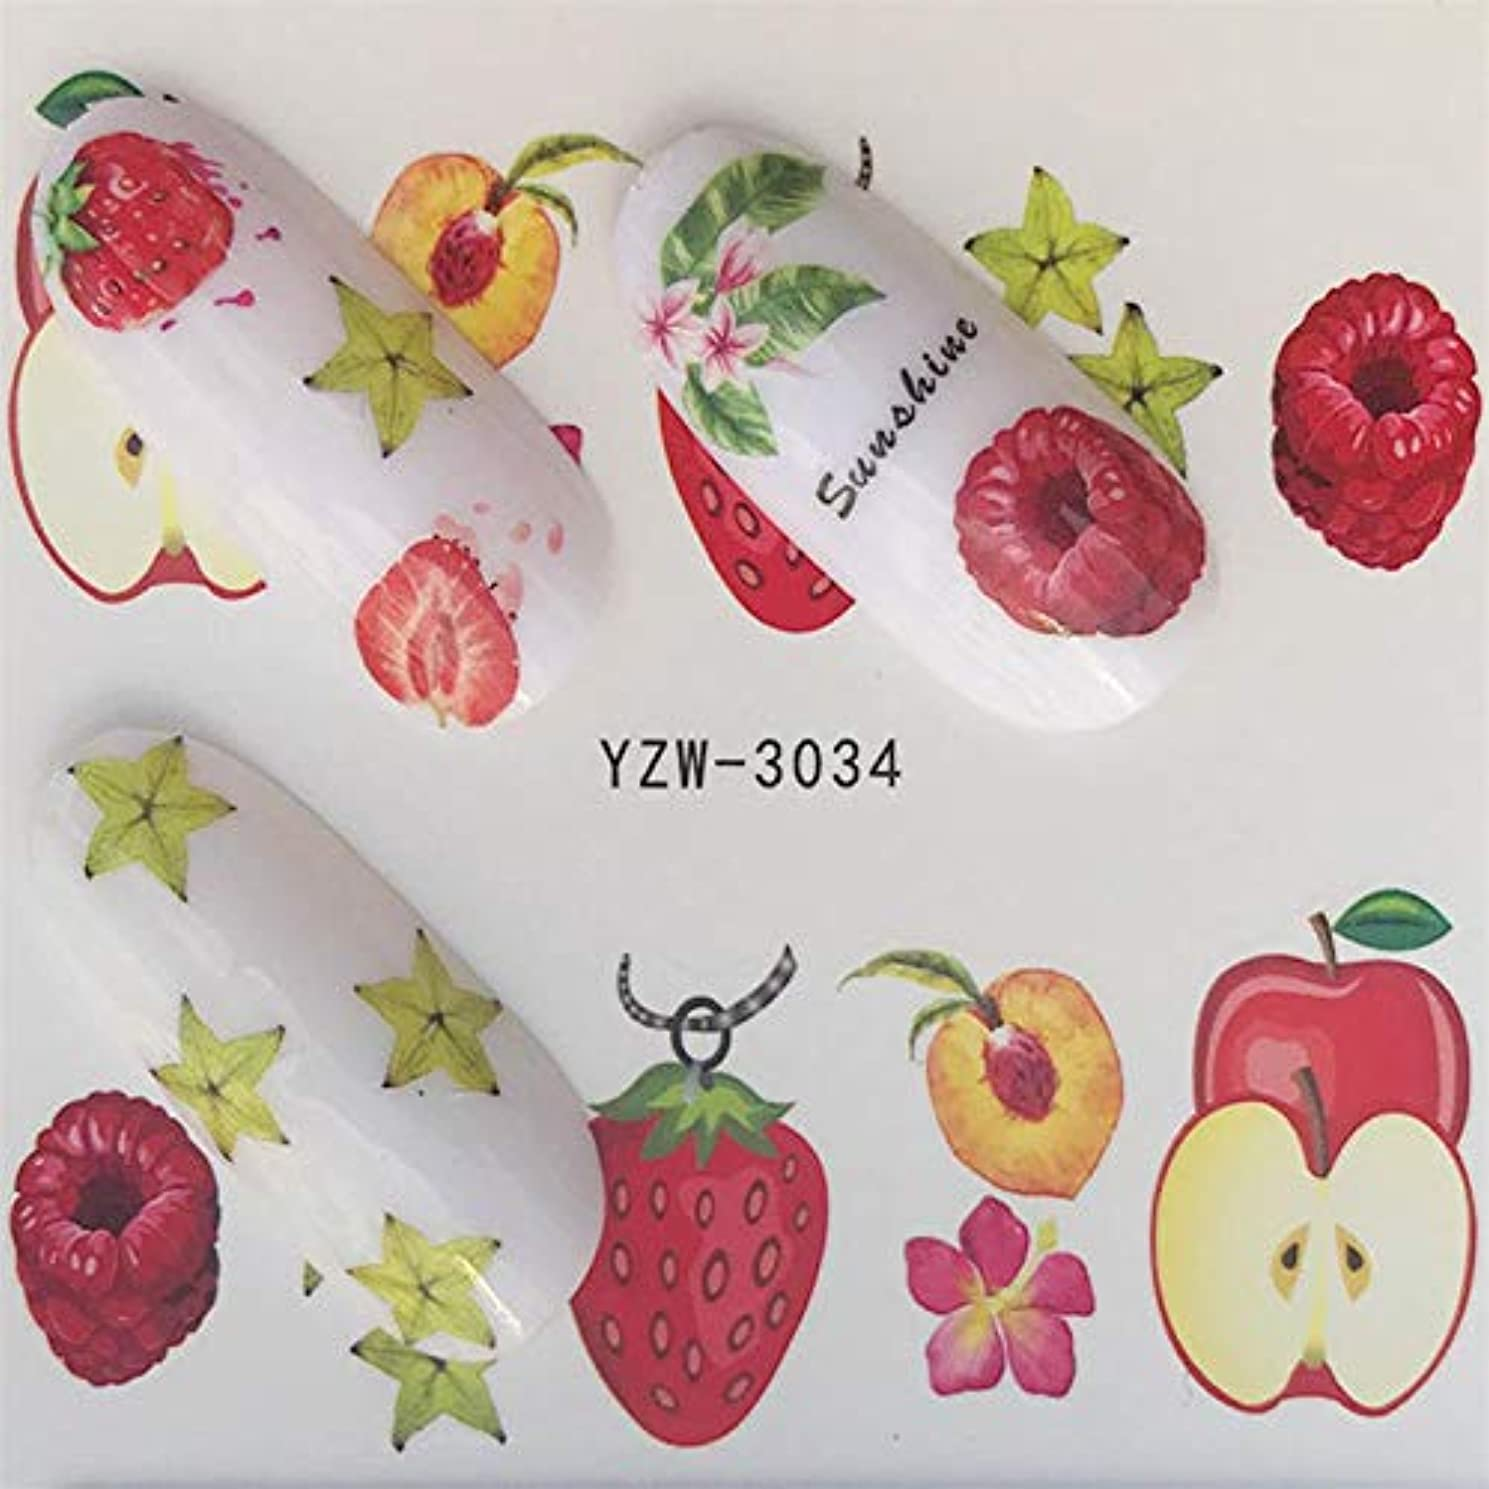 SUKTI&XIAO ネイルステッカー 1ピース漫画フラミンゴ/花/果物水転写ステッカーネイルアートデカールラップヒントマニキュアツール、Yzw-3034